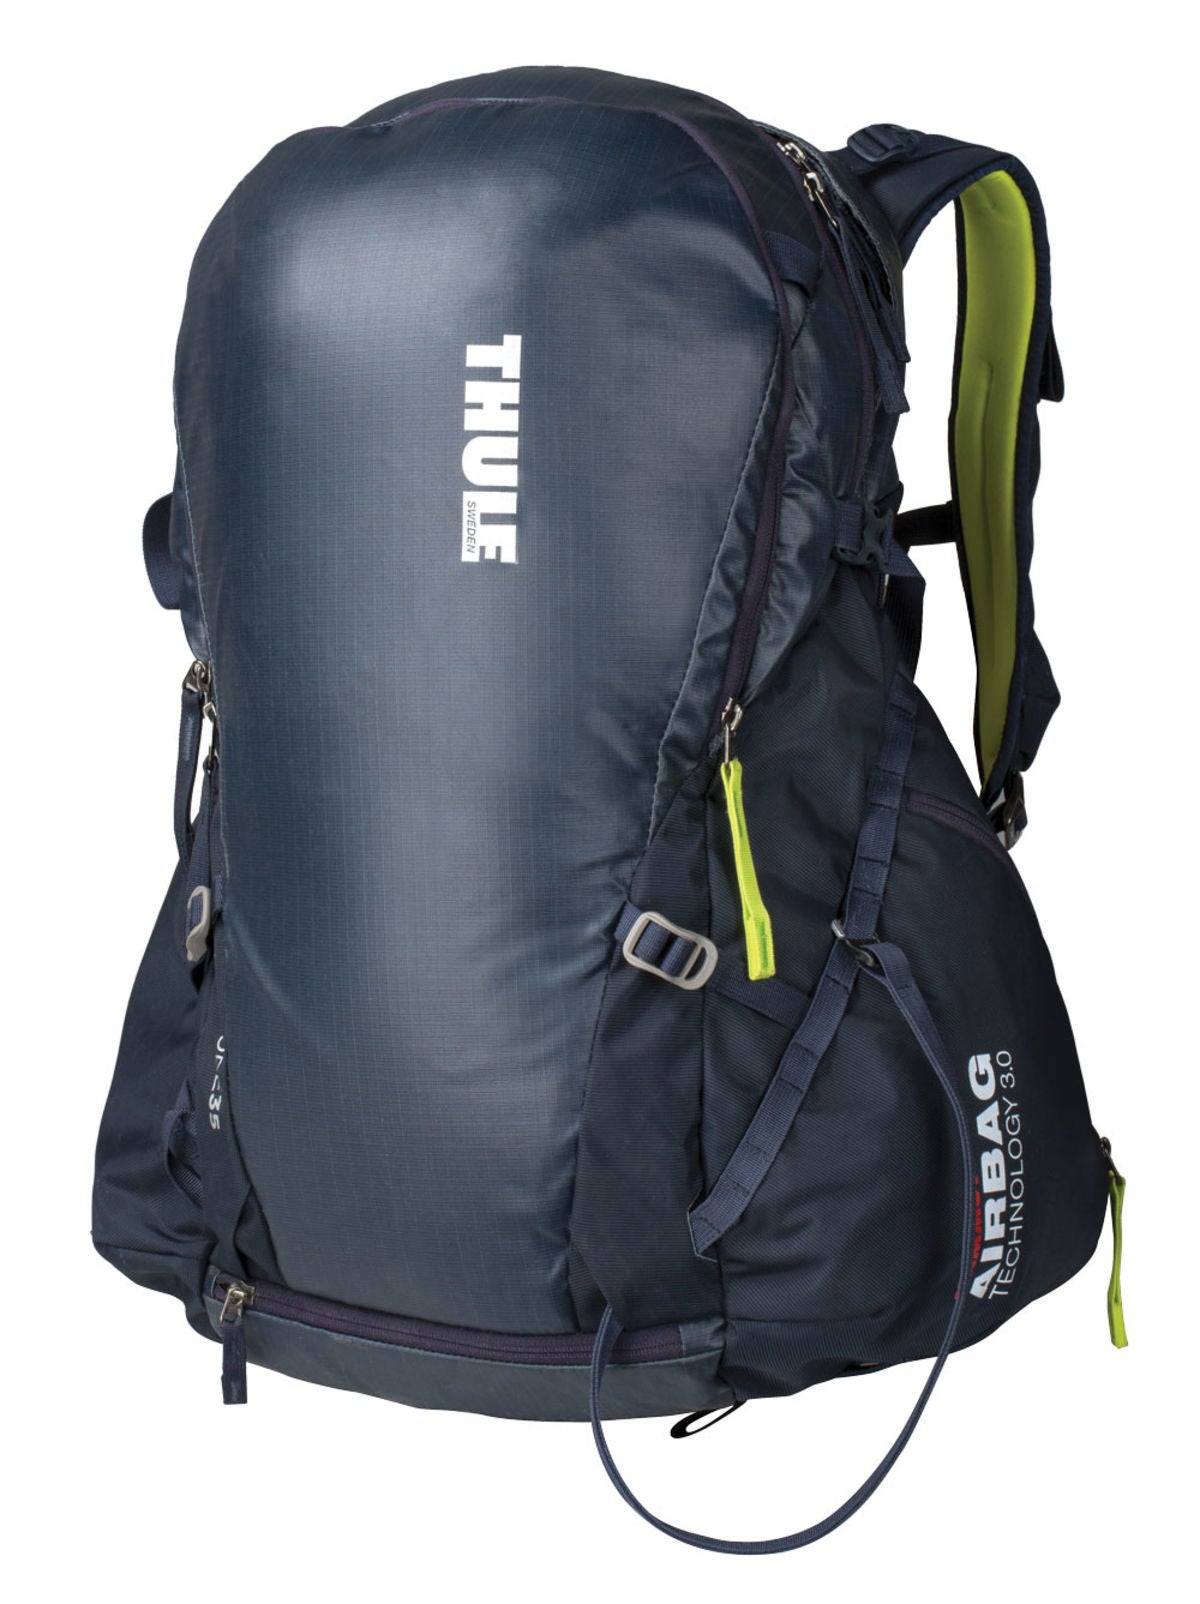 Thule Upslope 35 Backpack